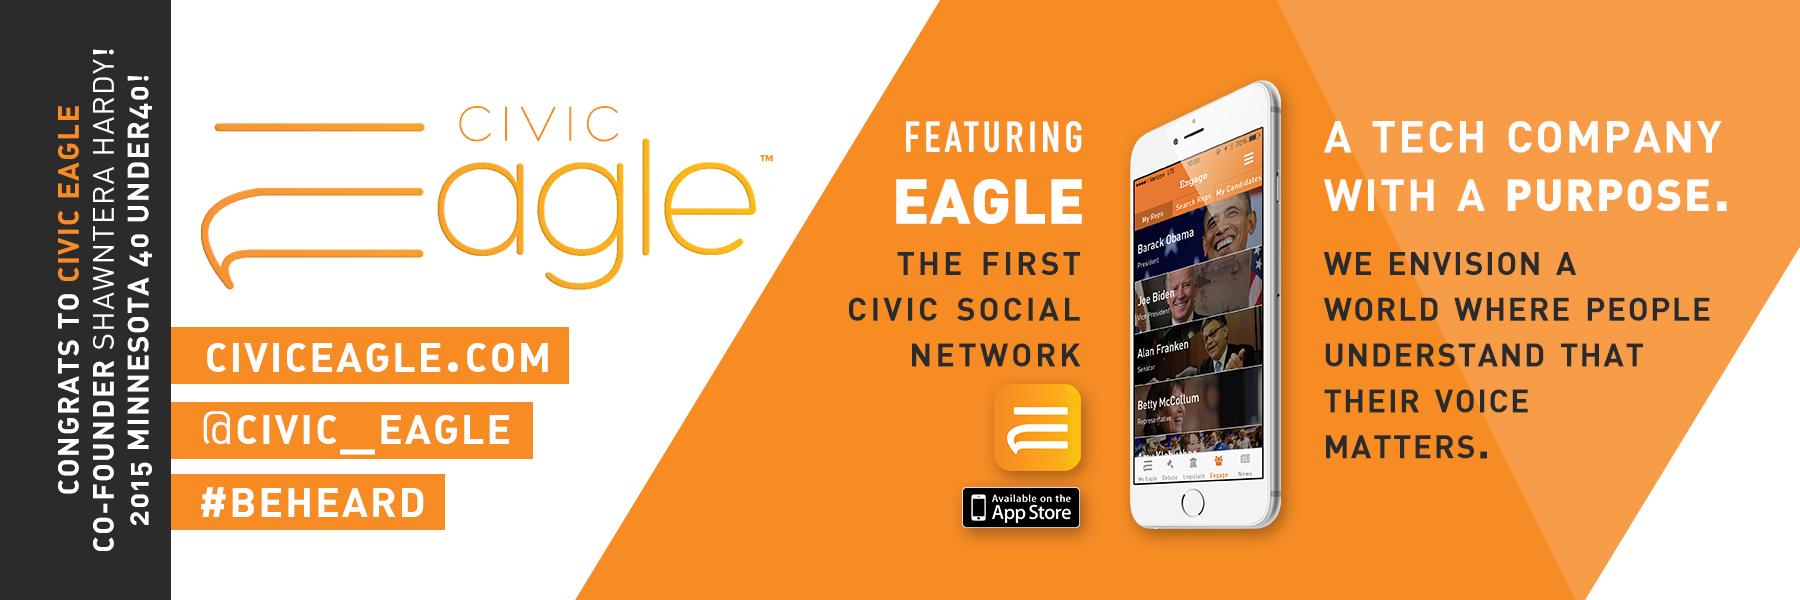 Civic Eagle_2x6.jpg